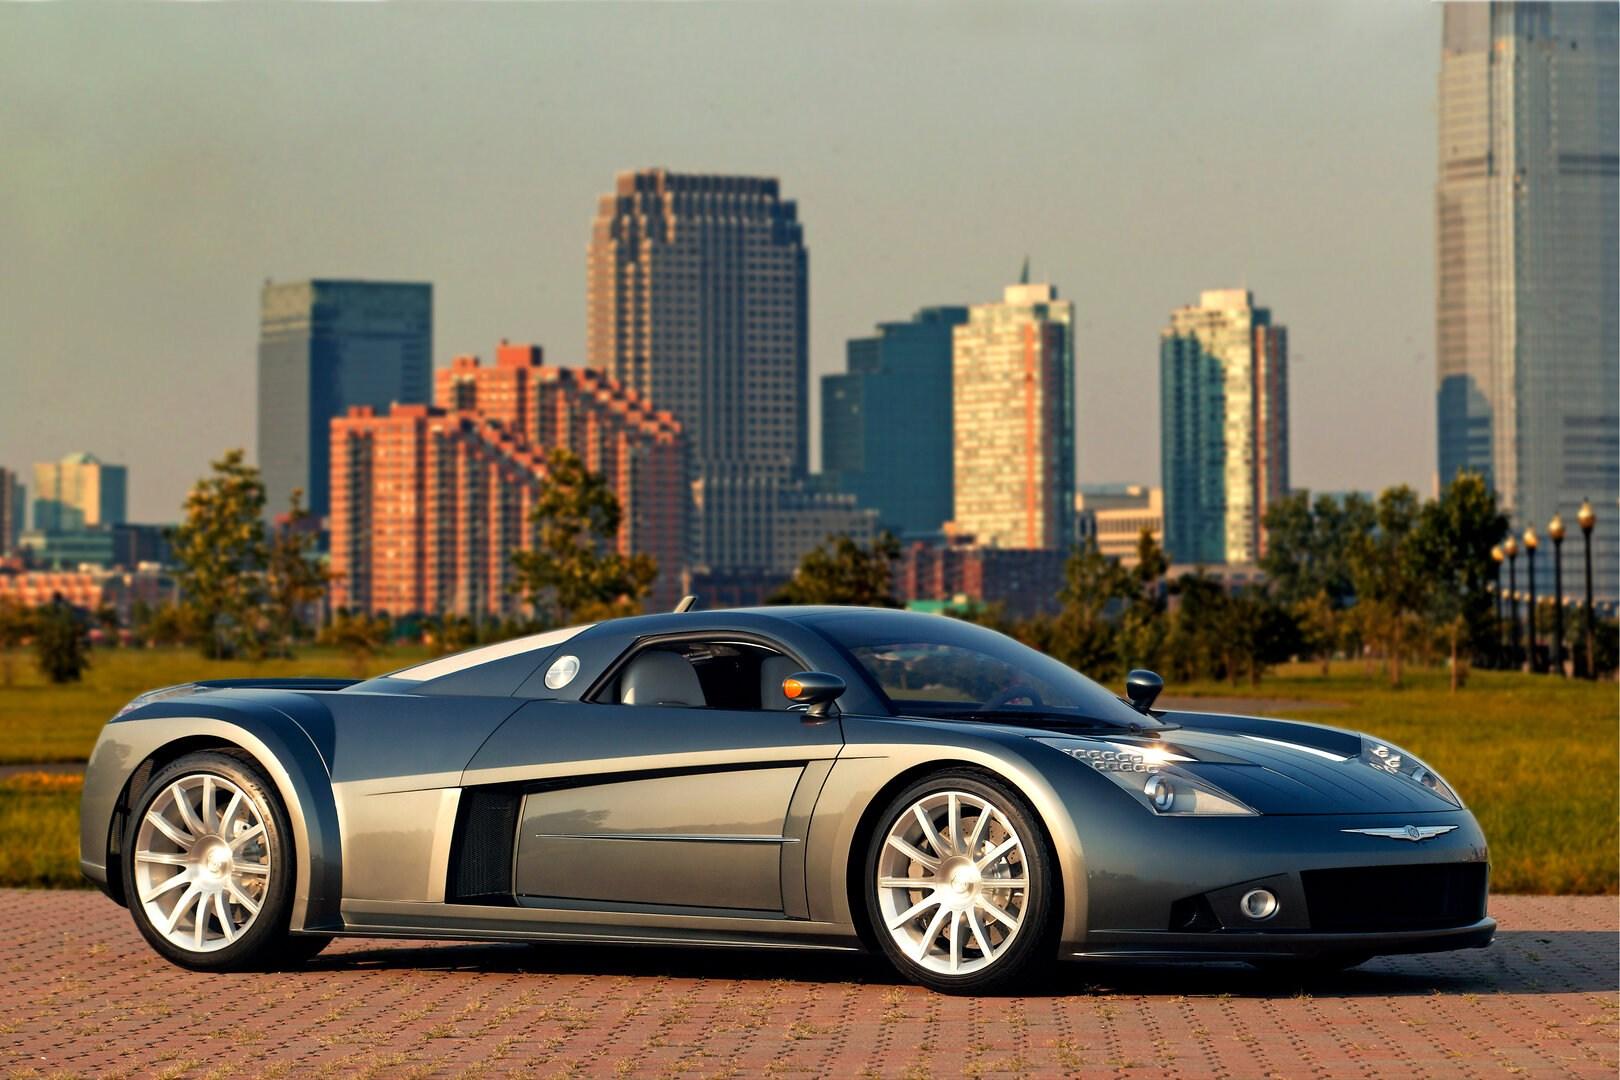 Chrysler ME Four Twelve Concept 2